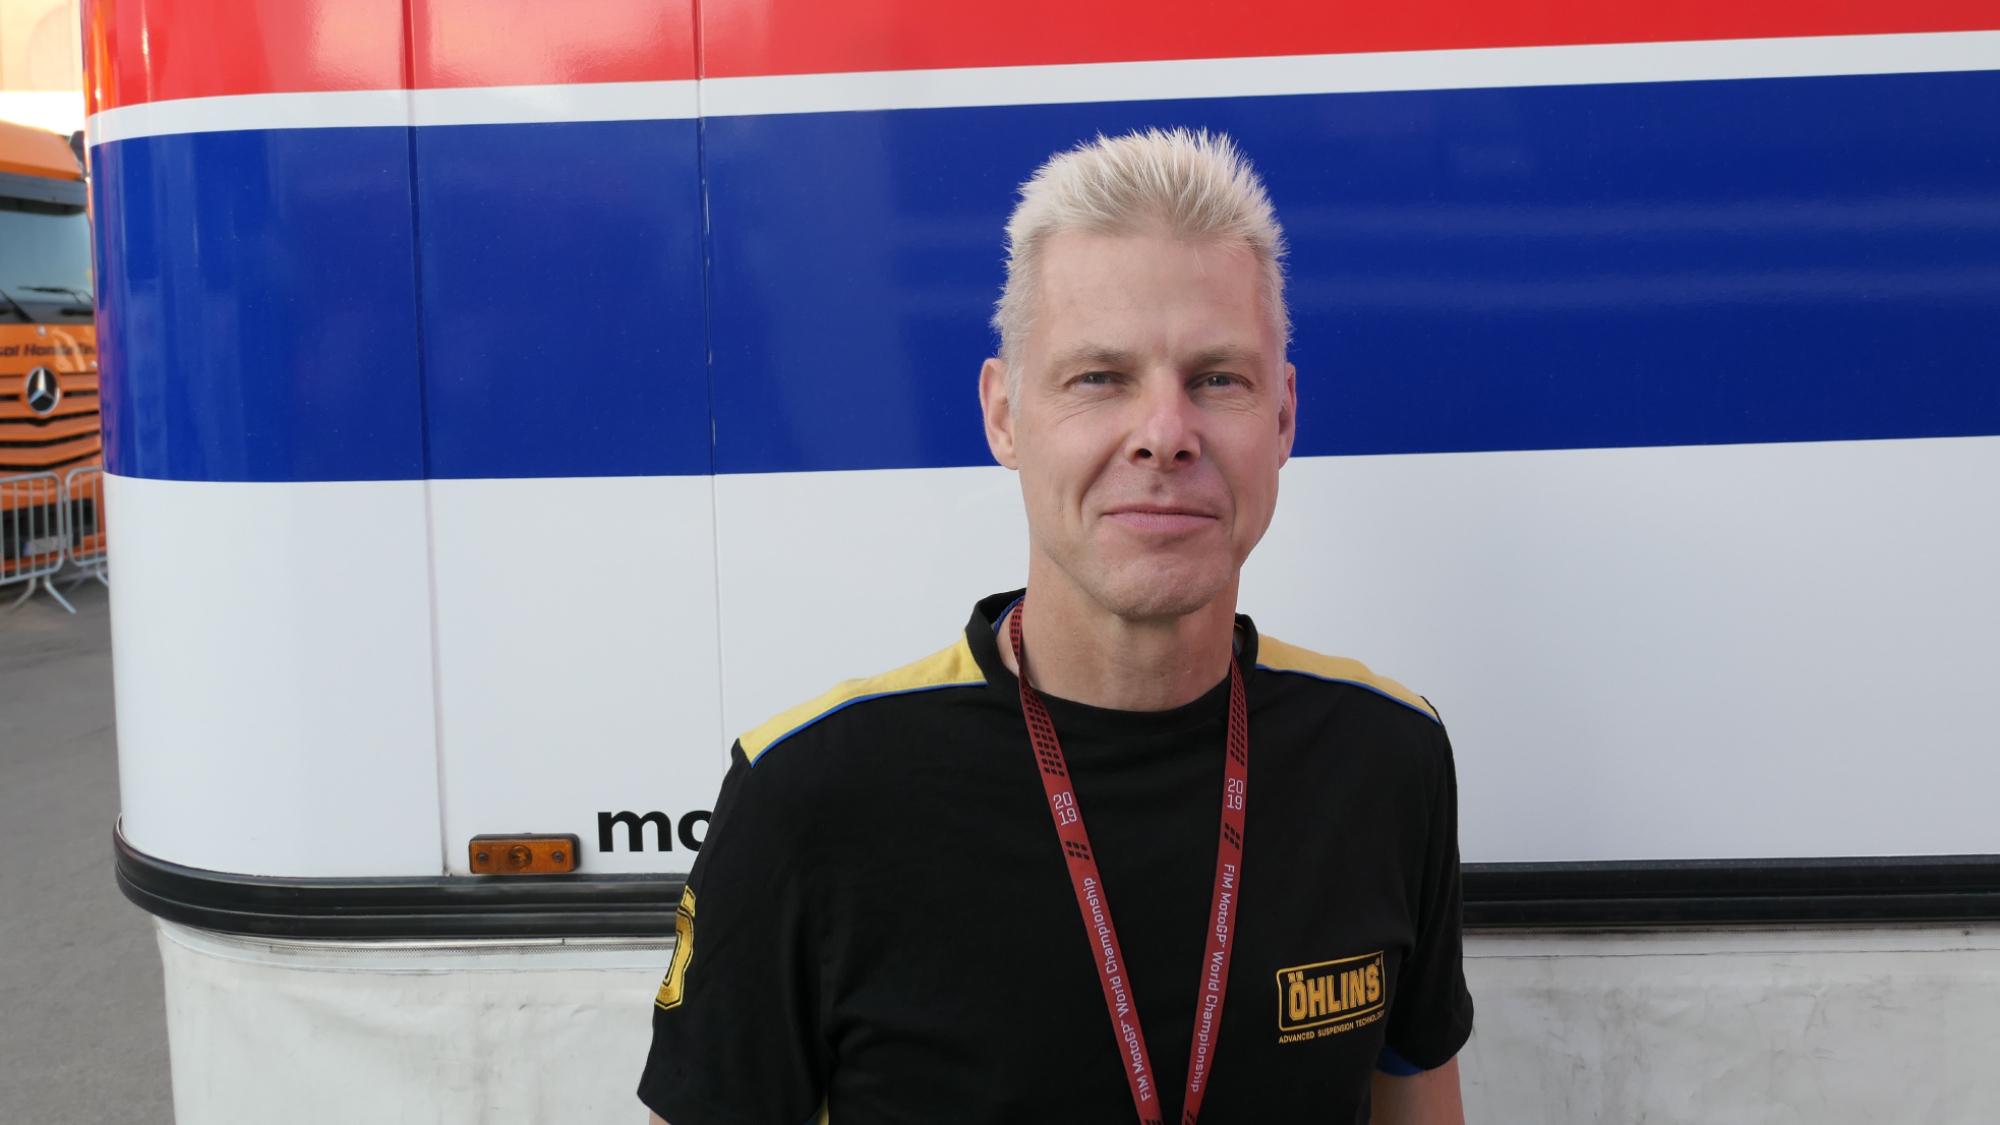 Ohlins suspension technician, 2020 MotoGP